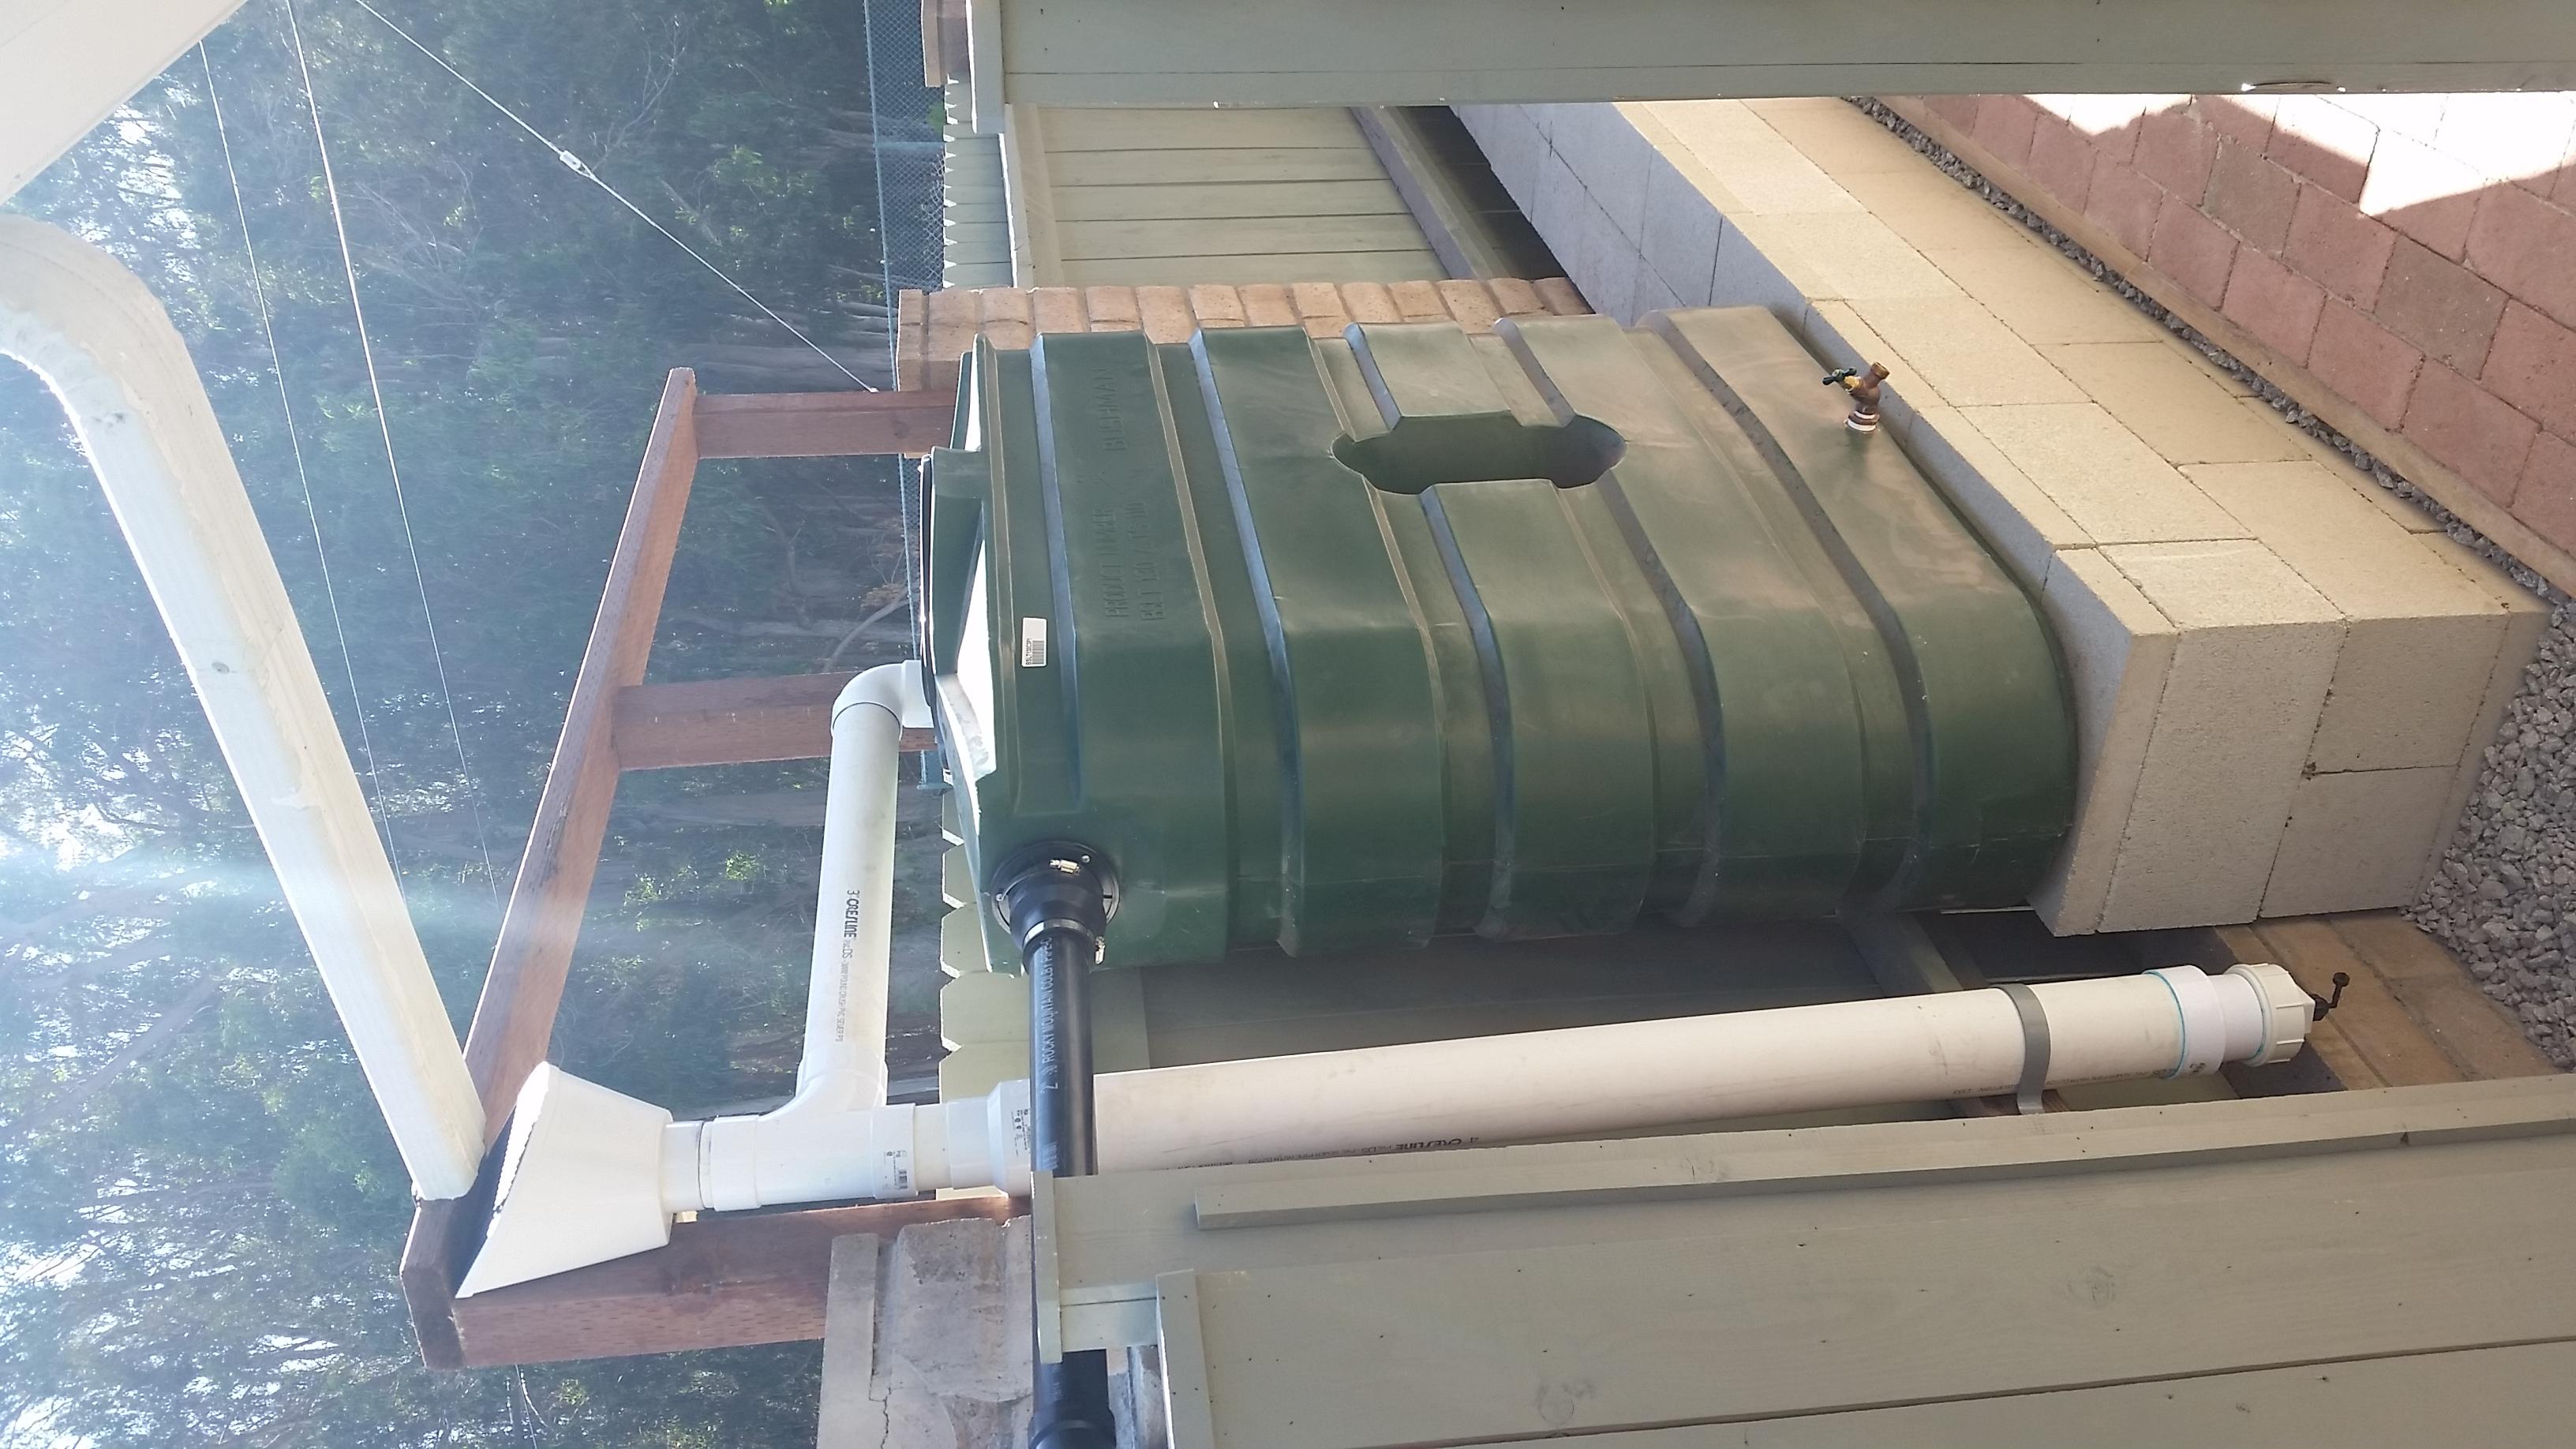 130 Gallon Slimline Tank